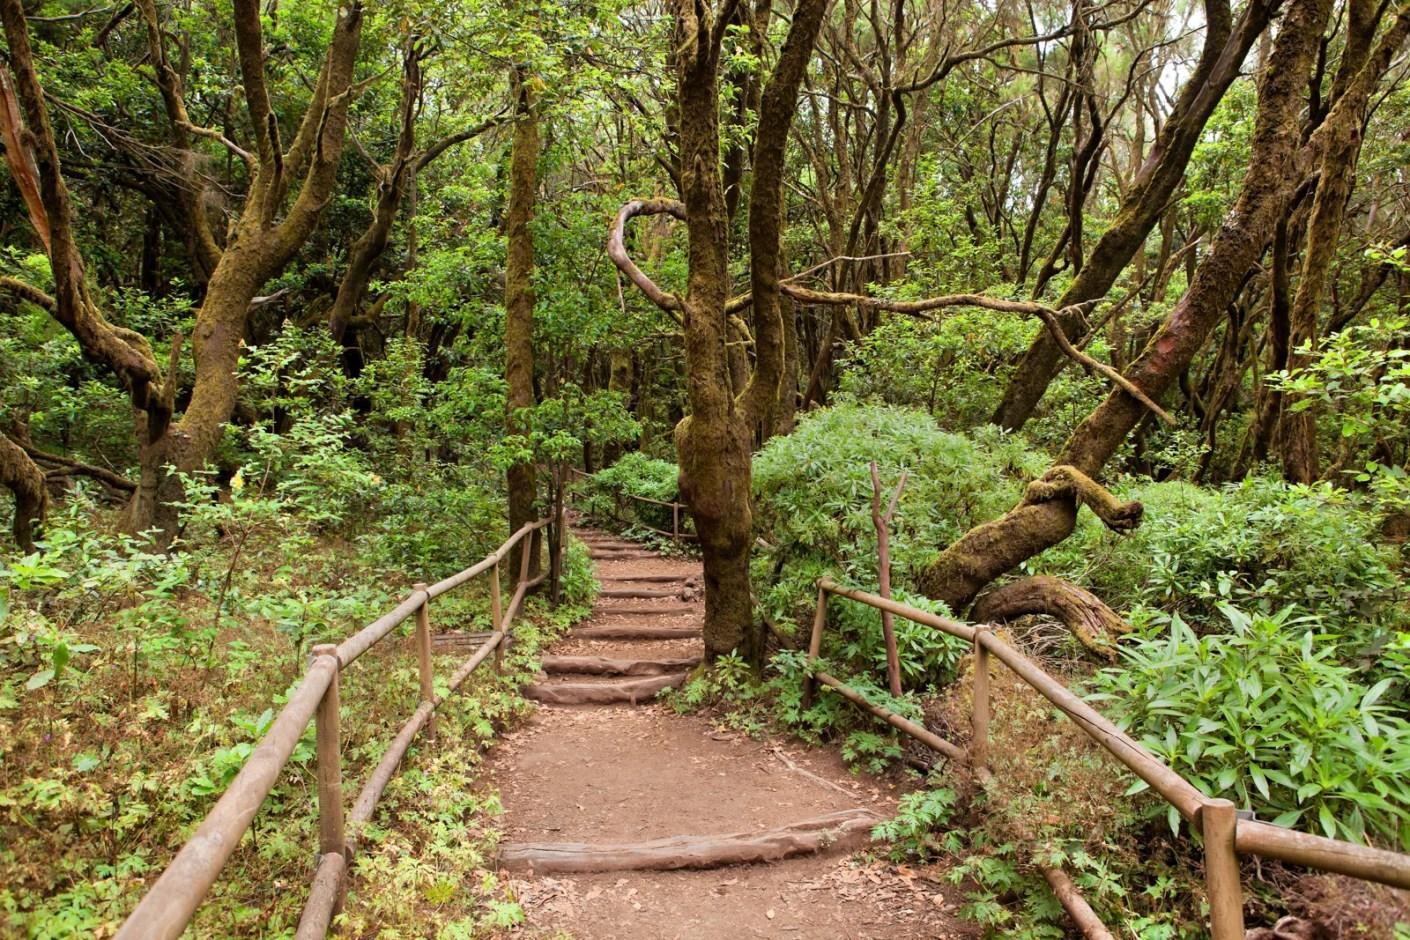 The rainforest in La Gomera, Parque Nacional de Garajonay, Canary islands, Spain. (Photo by nodff / Shutterstock)